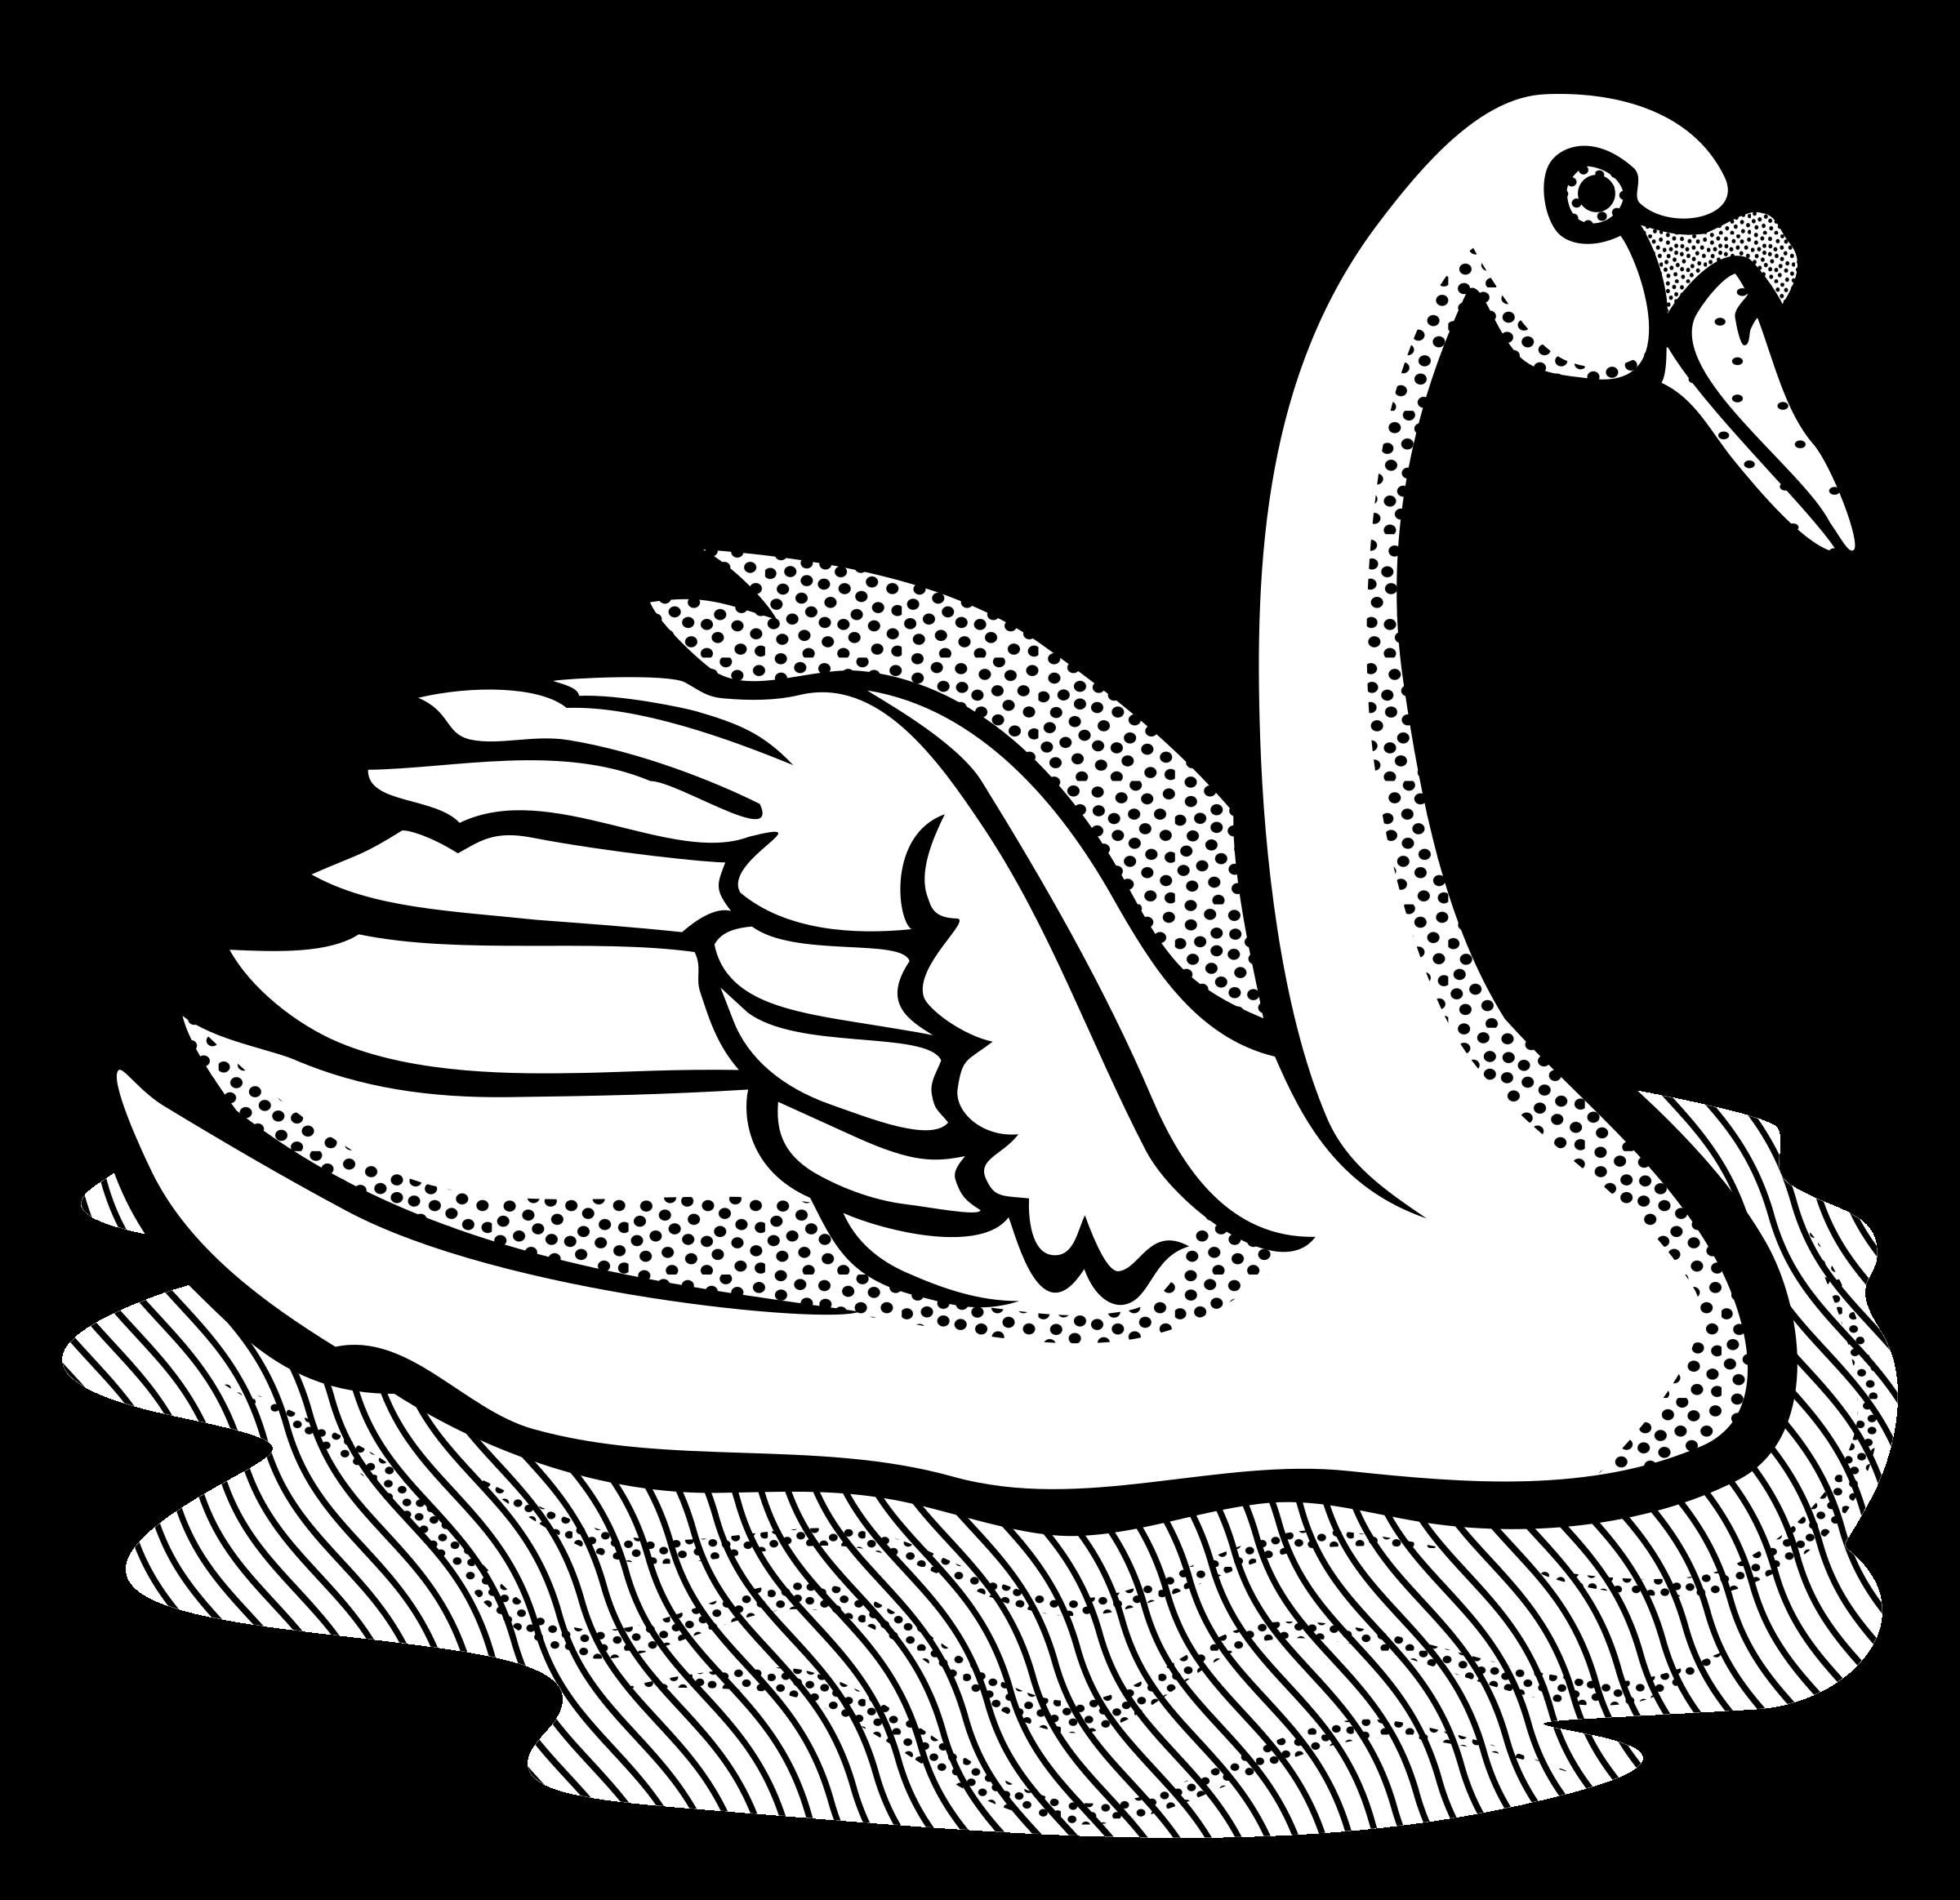 Clipart wedding swan. Line drawing at getdrawings